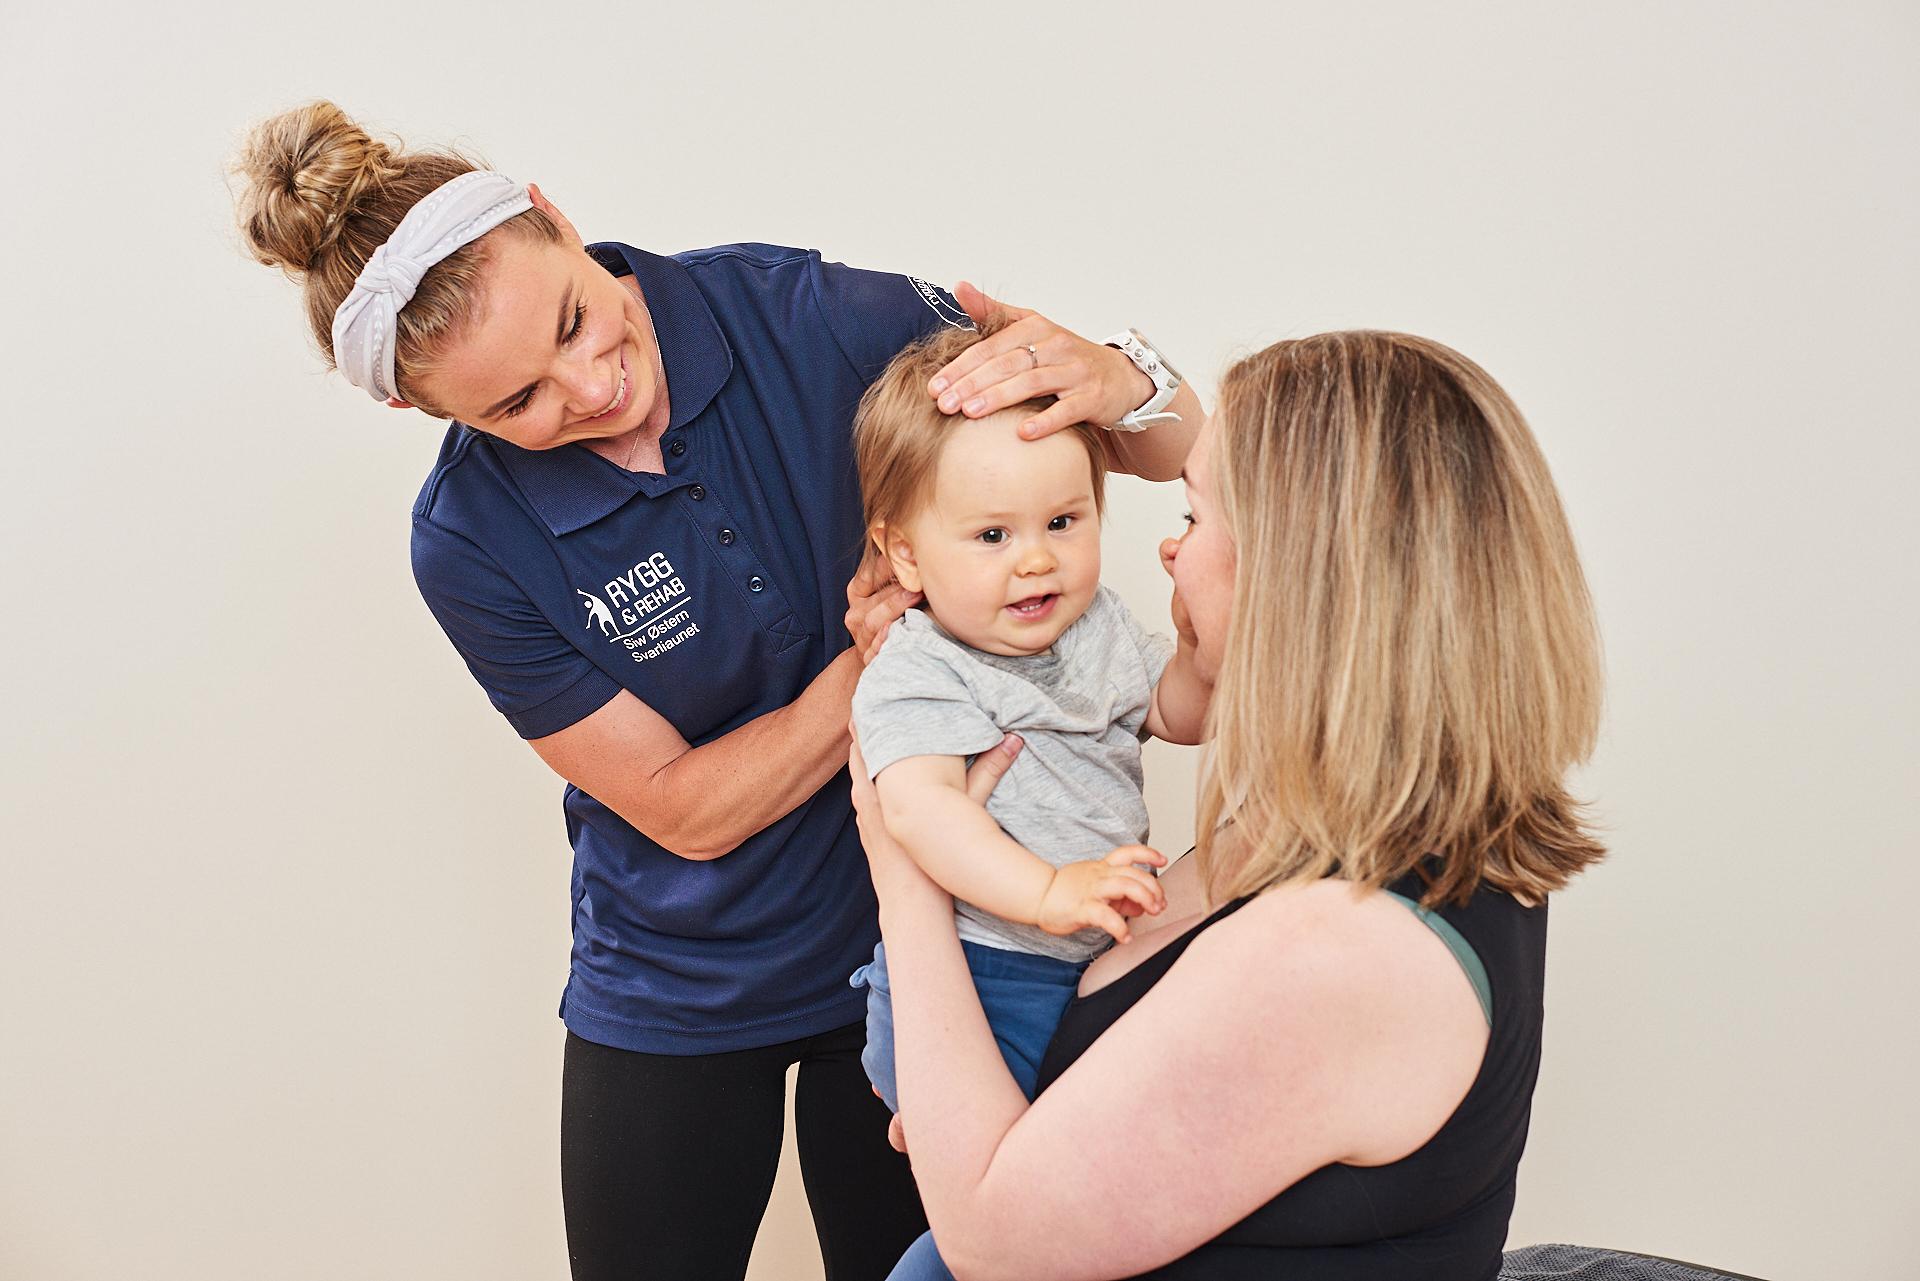 Behandling av spedbarn hos kiropraktor